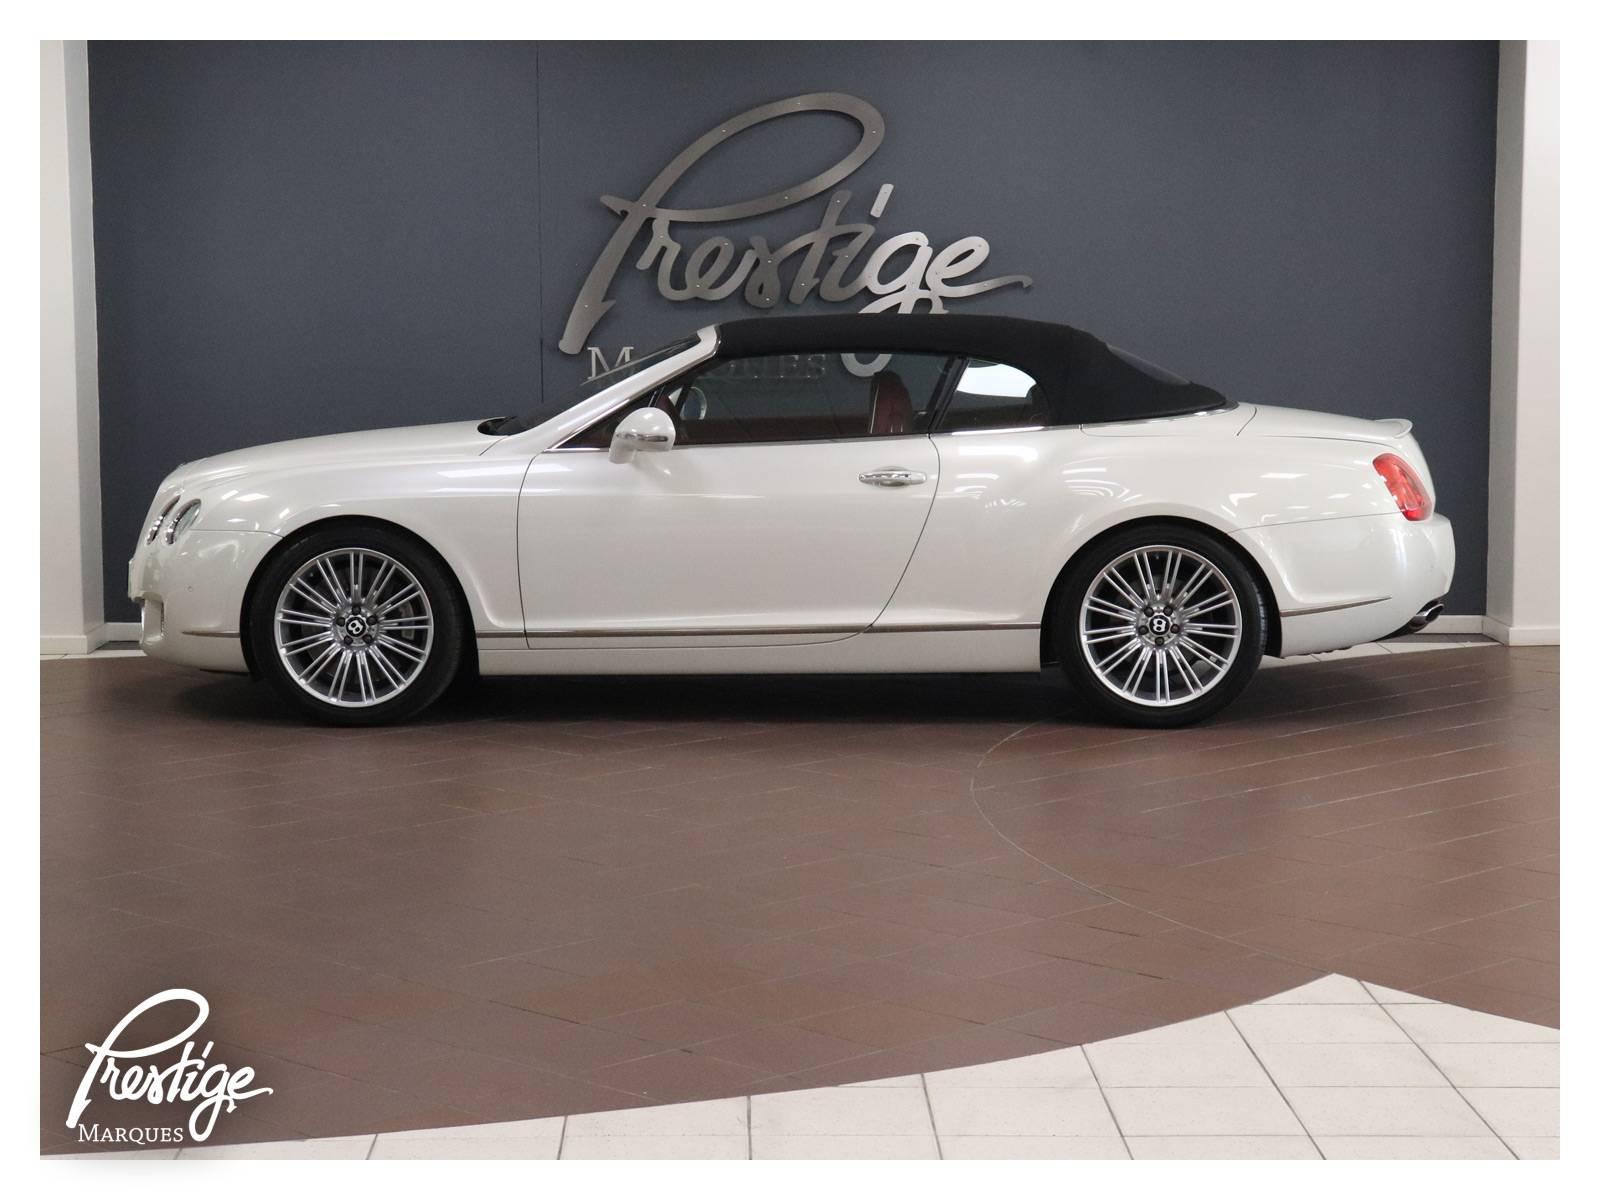 2011-Bentley-continental-Prestige-Marques-Randburg-Sandton-5